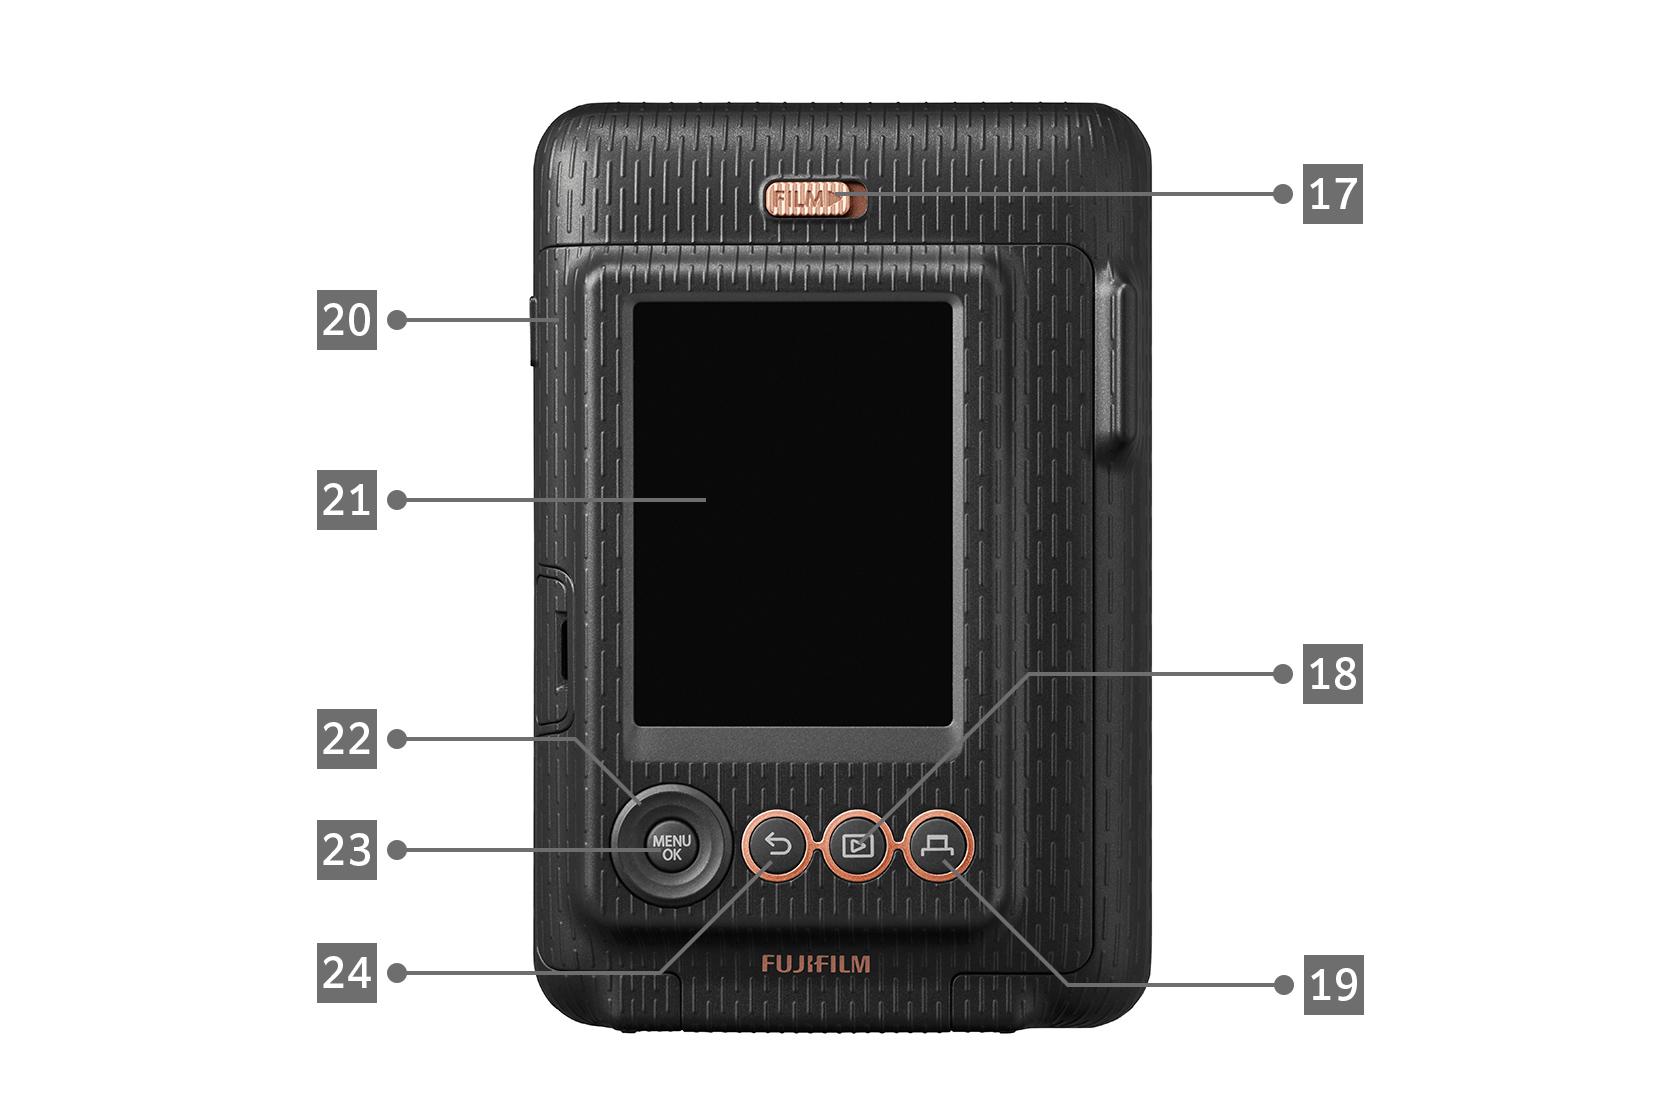 Rear View of a Black LiPlay camera